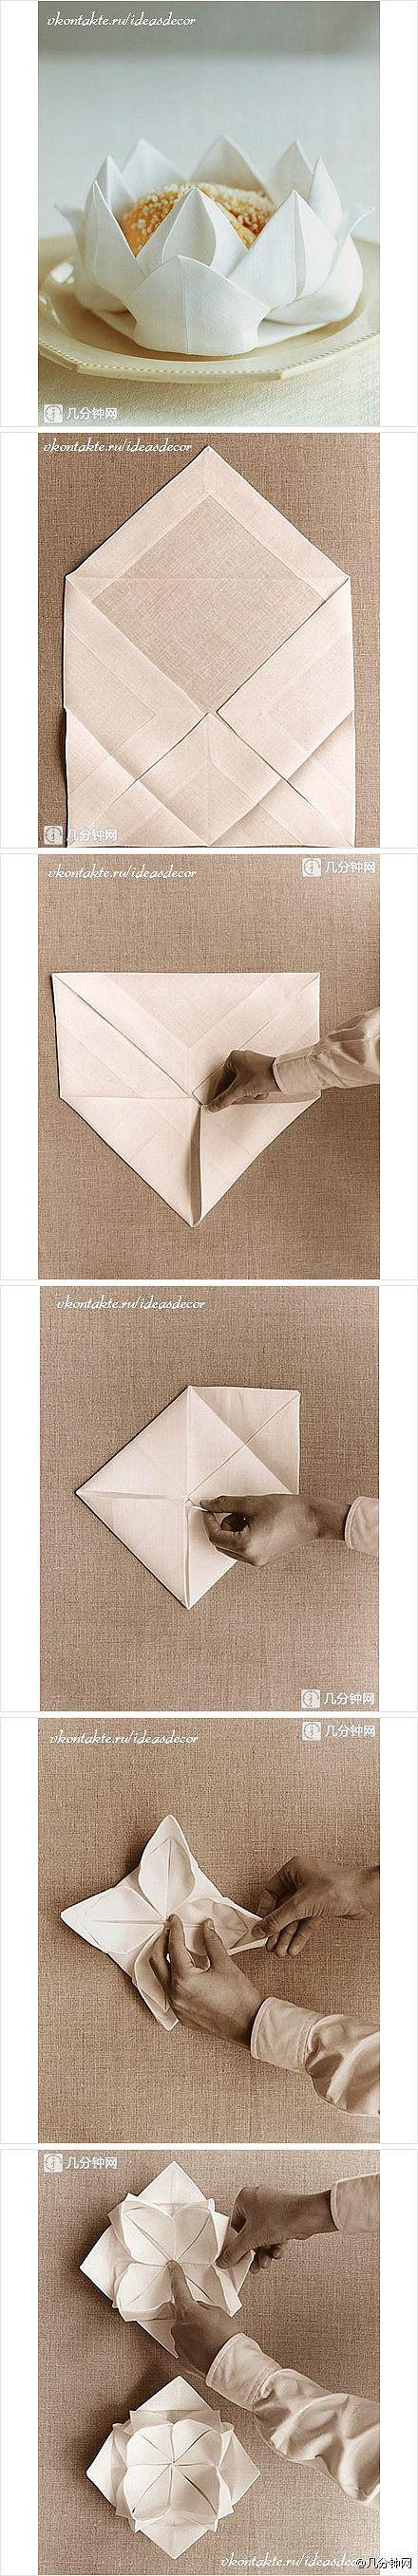 The 174 best images about folding facewashers towels etc - Paper napkin folding ideas ...